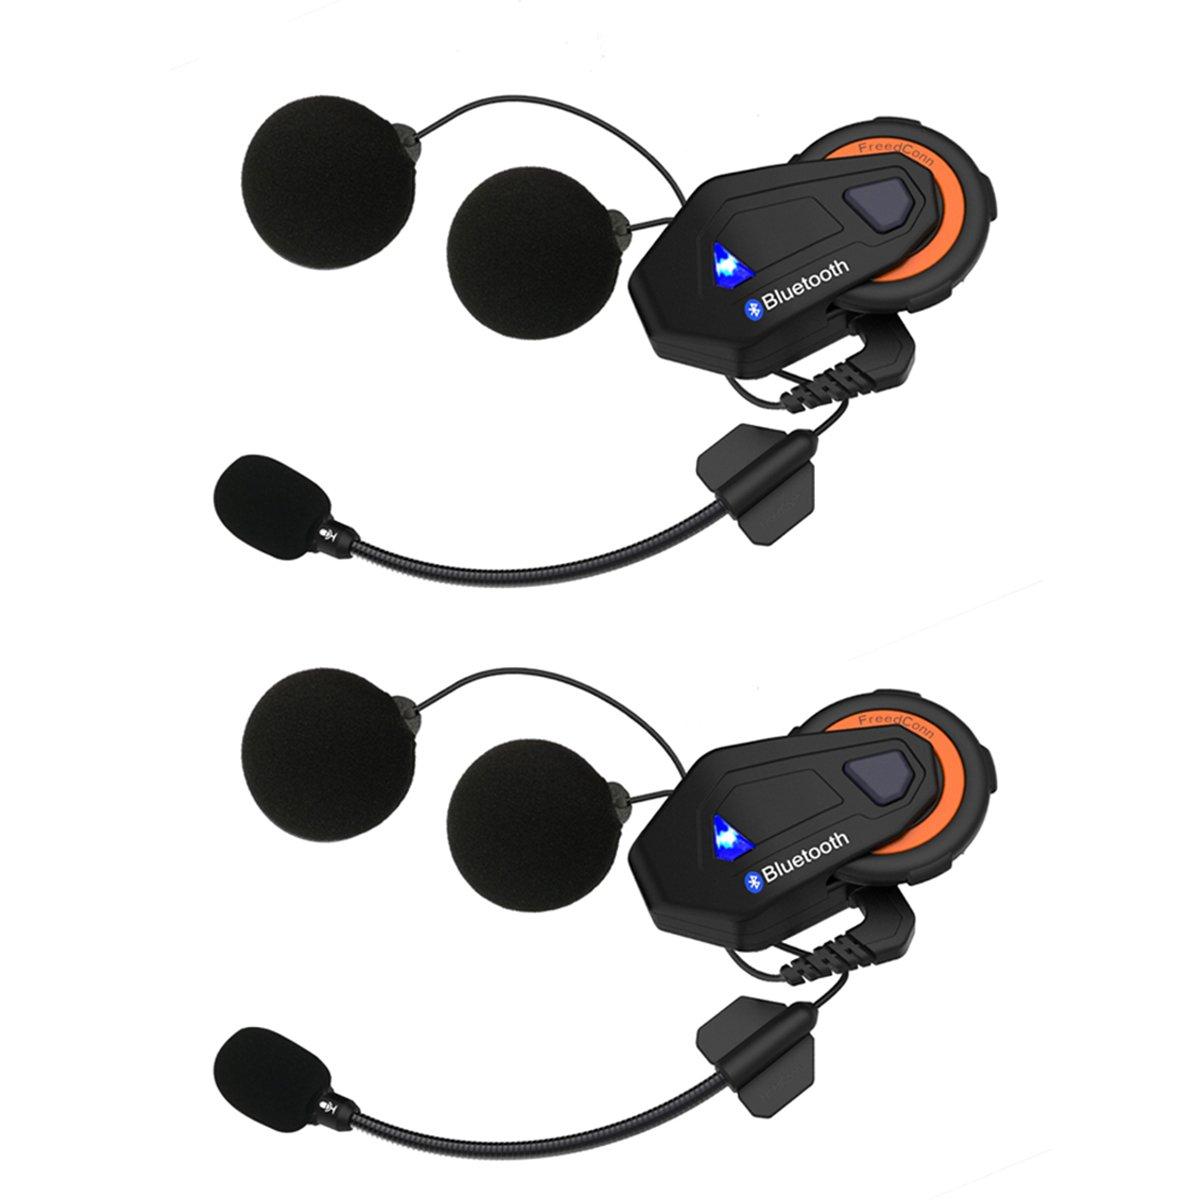 Helmet Communication Systems Group Intercom, Waterproof 1000M T-MAX Helmet Bluetooth Headset Talking Intercom Handsfree for Motorcycle Skiing (Full Duplex, 6 Riders Pairing, FM Radio, 1 Pack) FreedConn